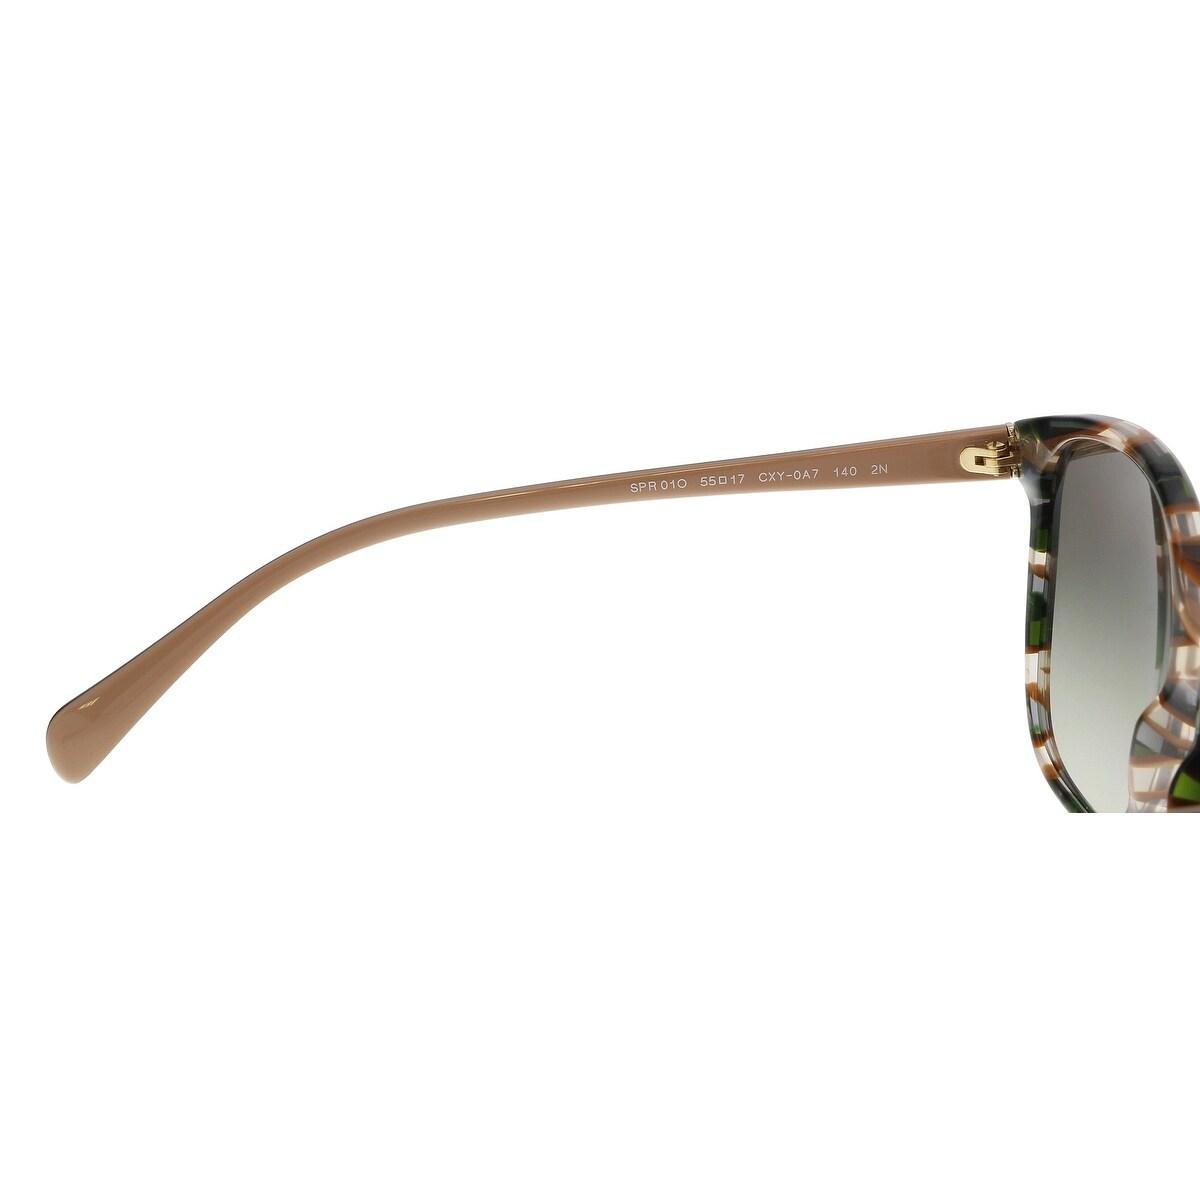 5a2528bcd5fd6 ... pr 01os seasonal opsm 85100 a970e coupon for shop prada pr01os cxy0a7  havana green brown ear square sunglasses 55 17 140 on ...